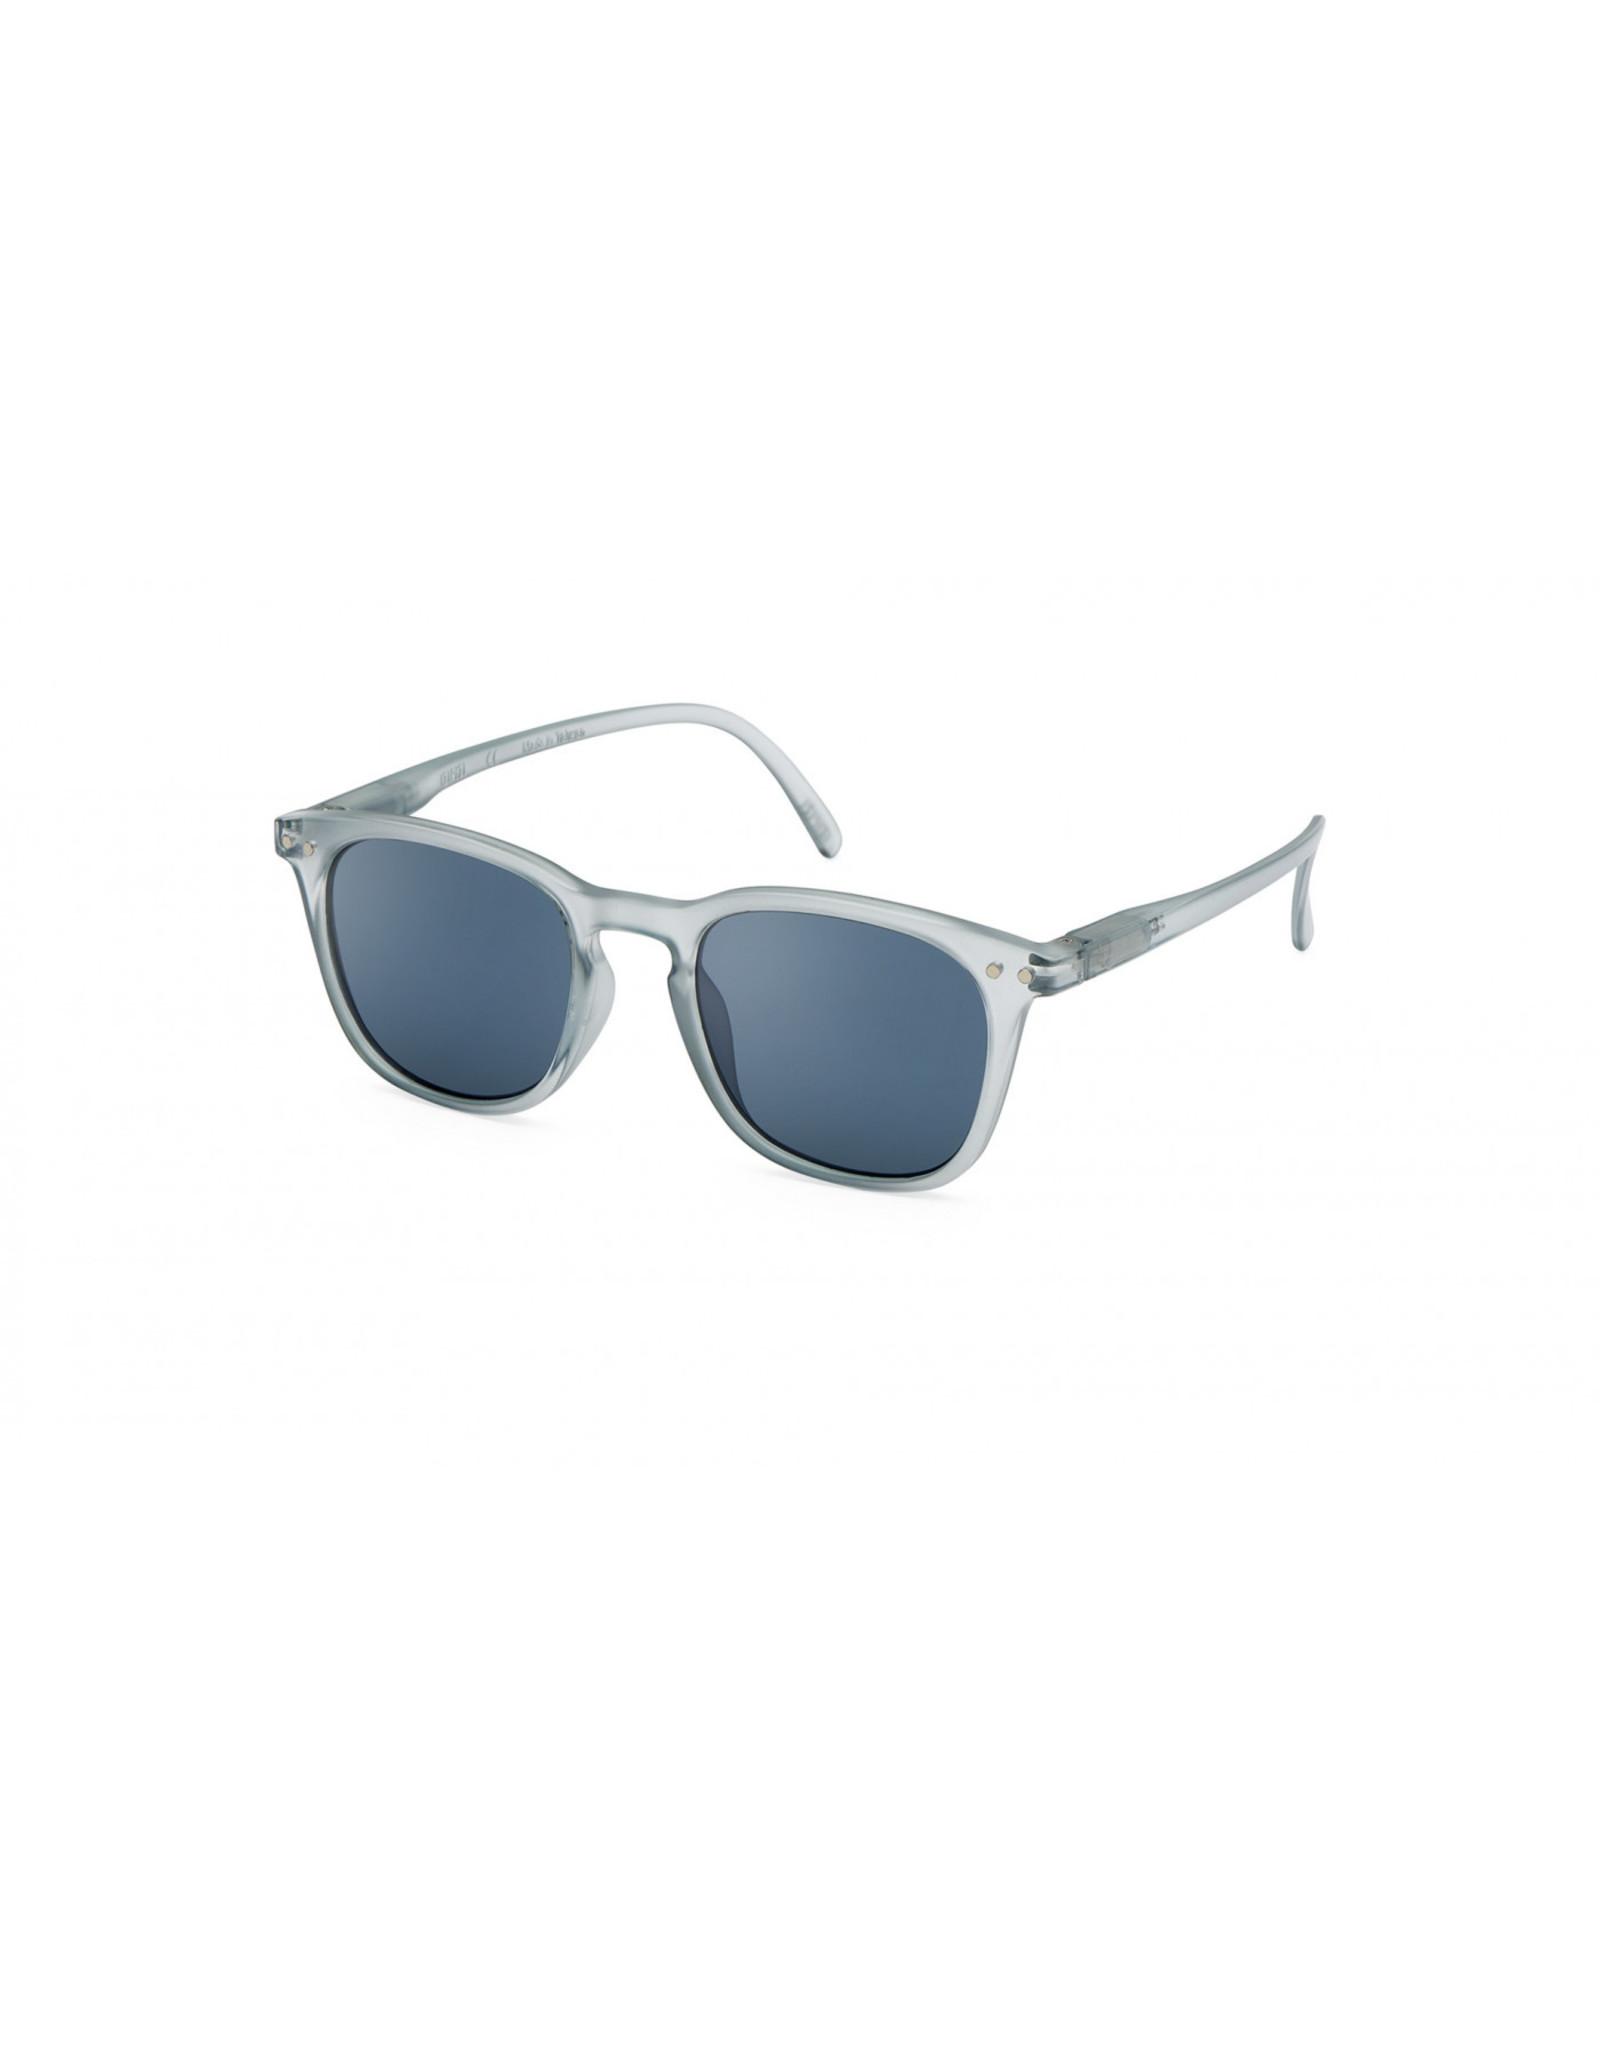 IZIPIZI SUN JUNIOR Frosted Blue  #E